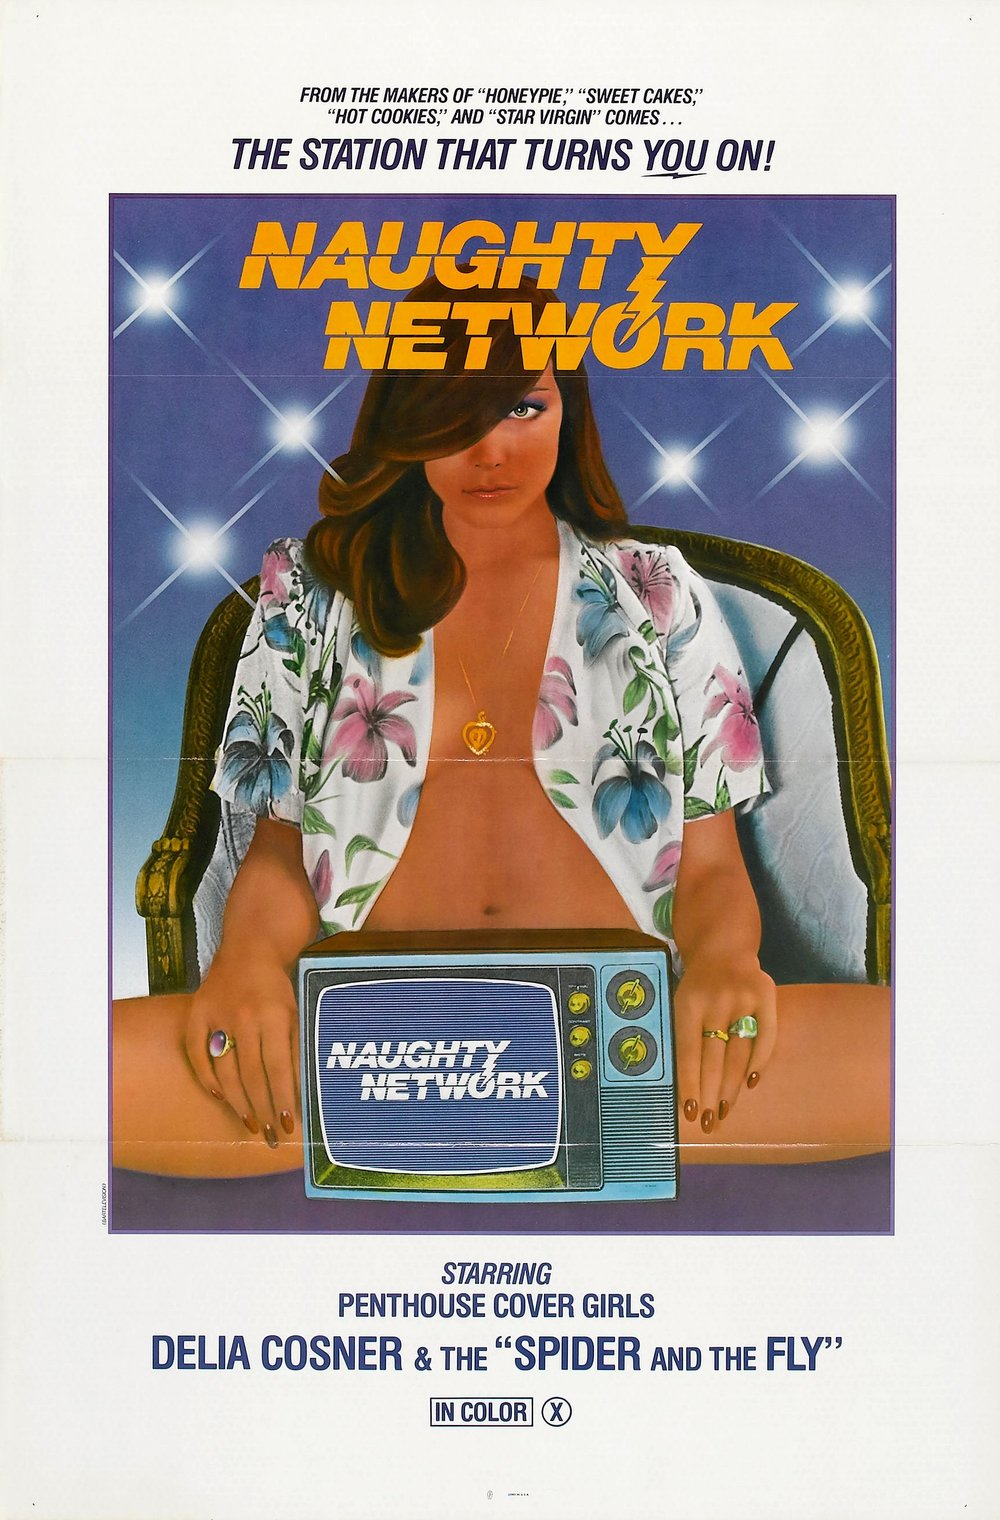 naughty_network_poster_01.jpg